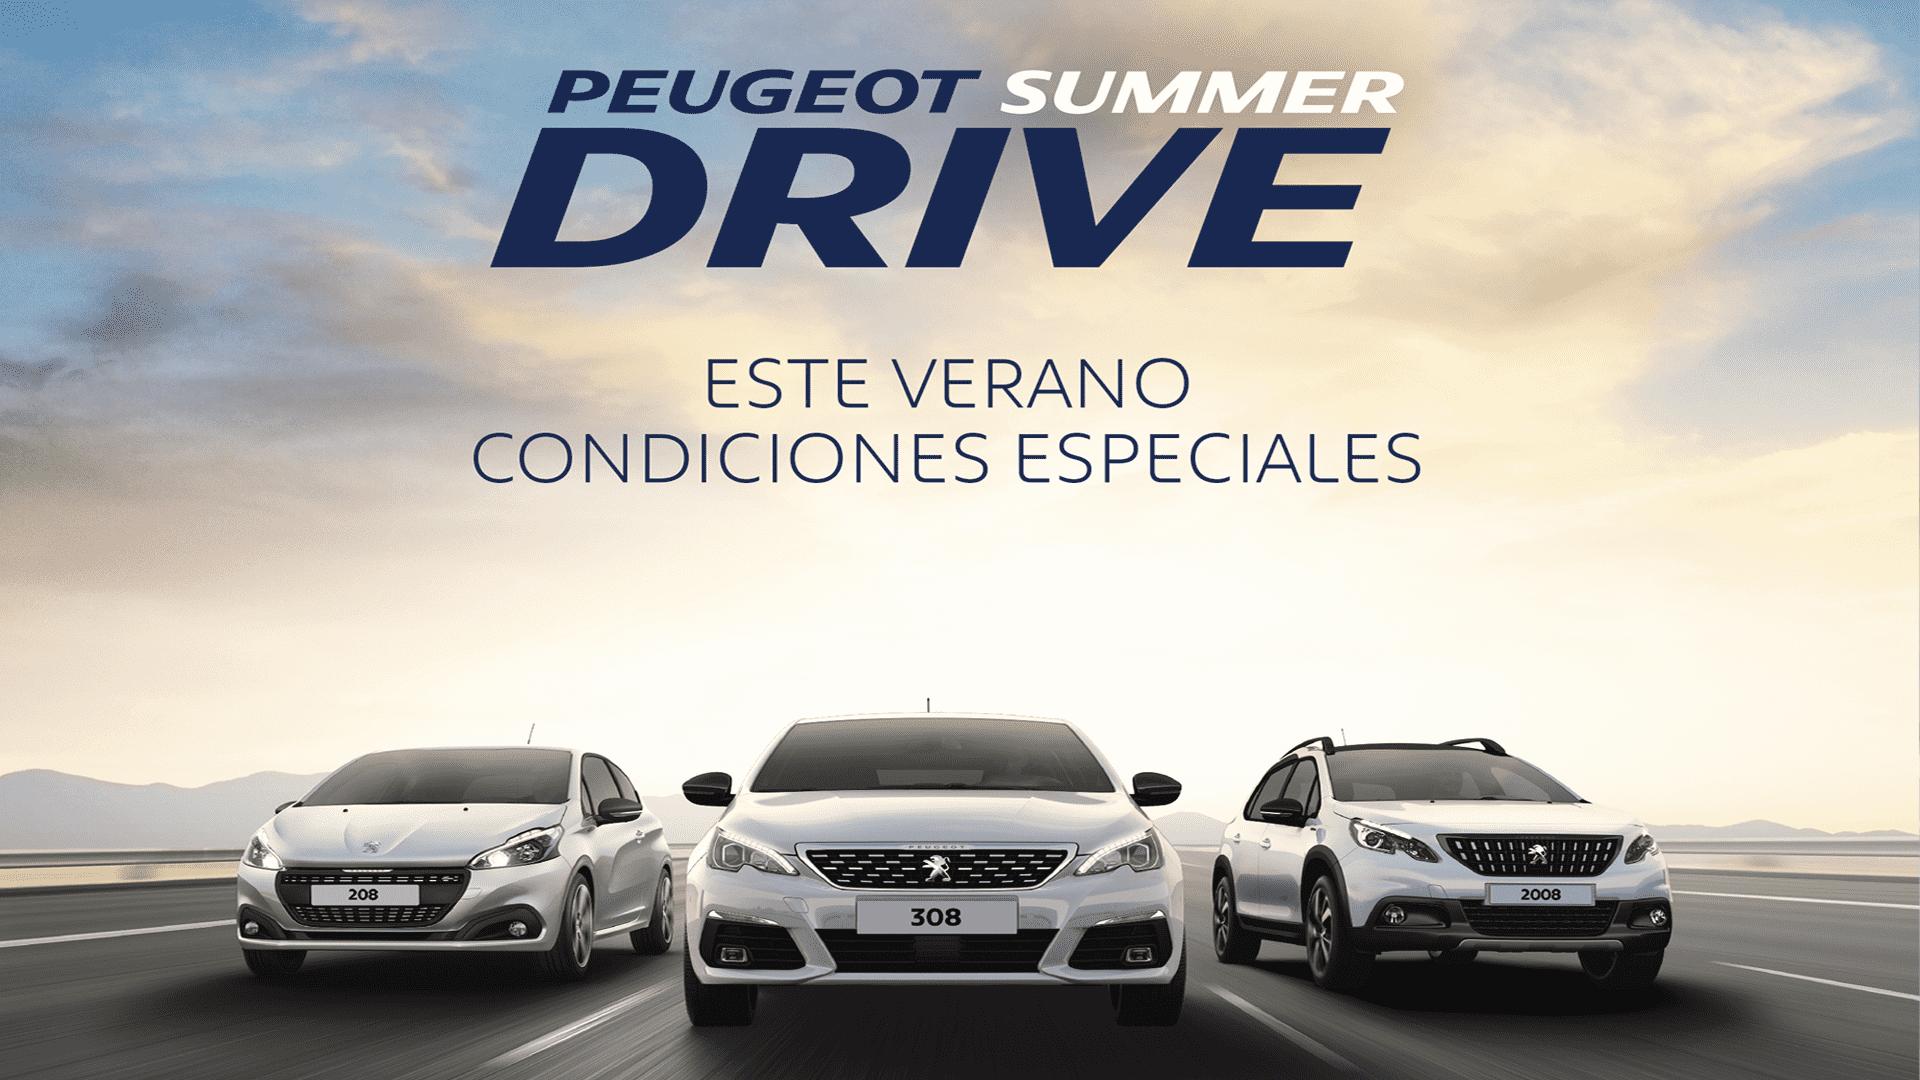 ESTE VERANO, APROVECHA LAS OFERTAS PEUGEOT SUMMER DRIVE